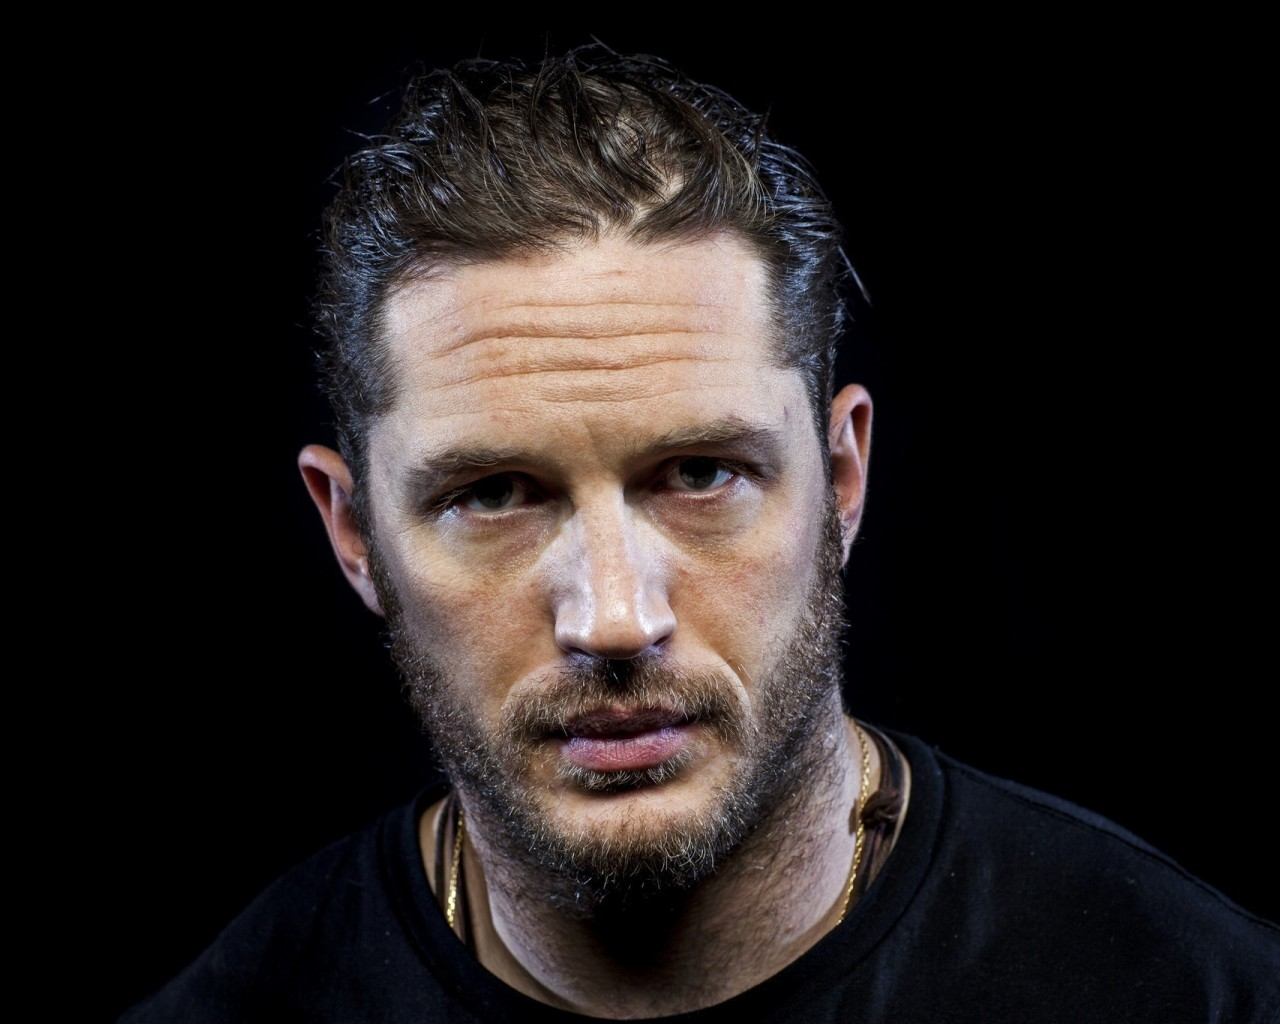 tom-hardy-actor-man-tom-hardi